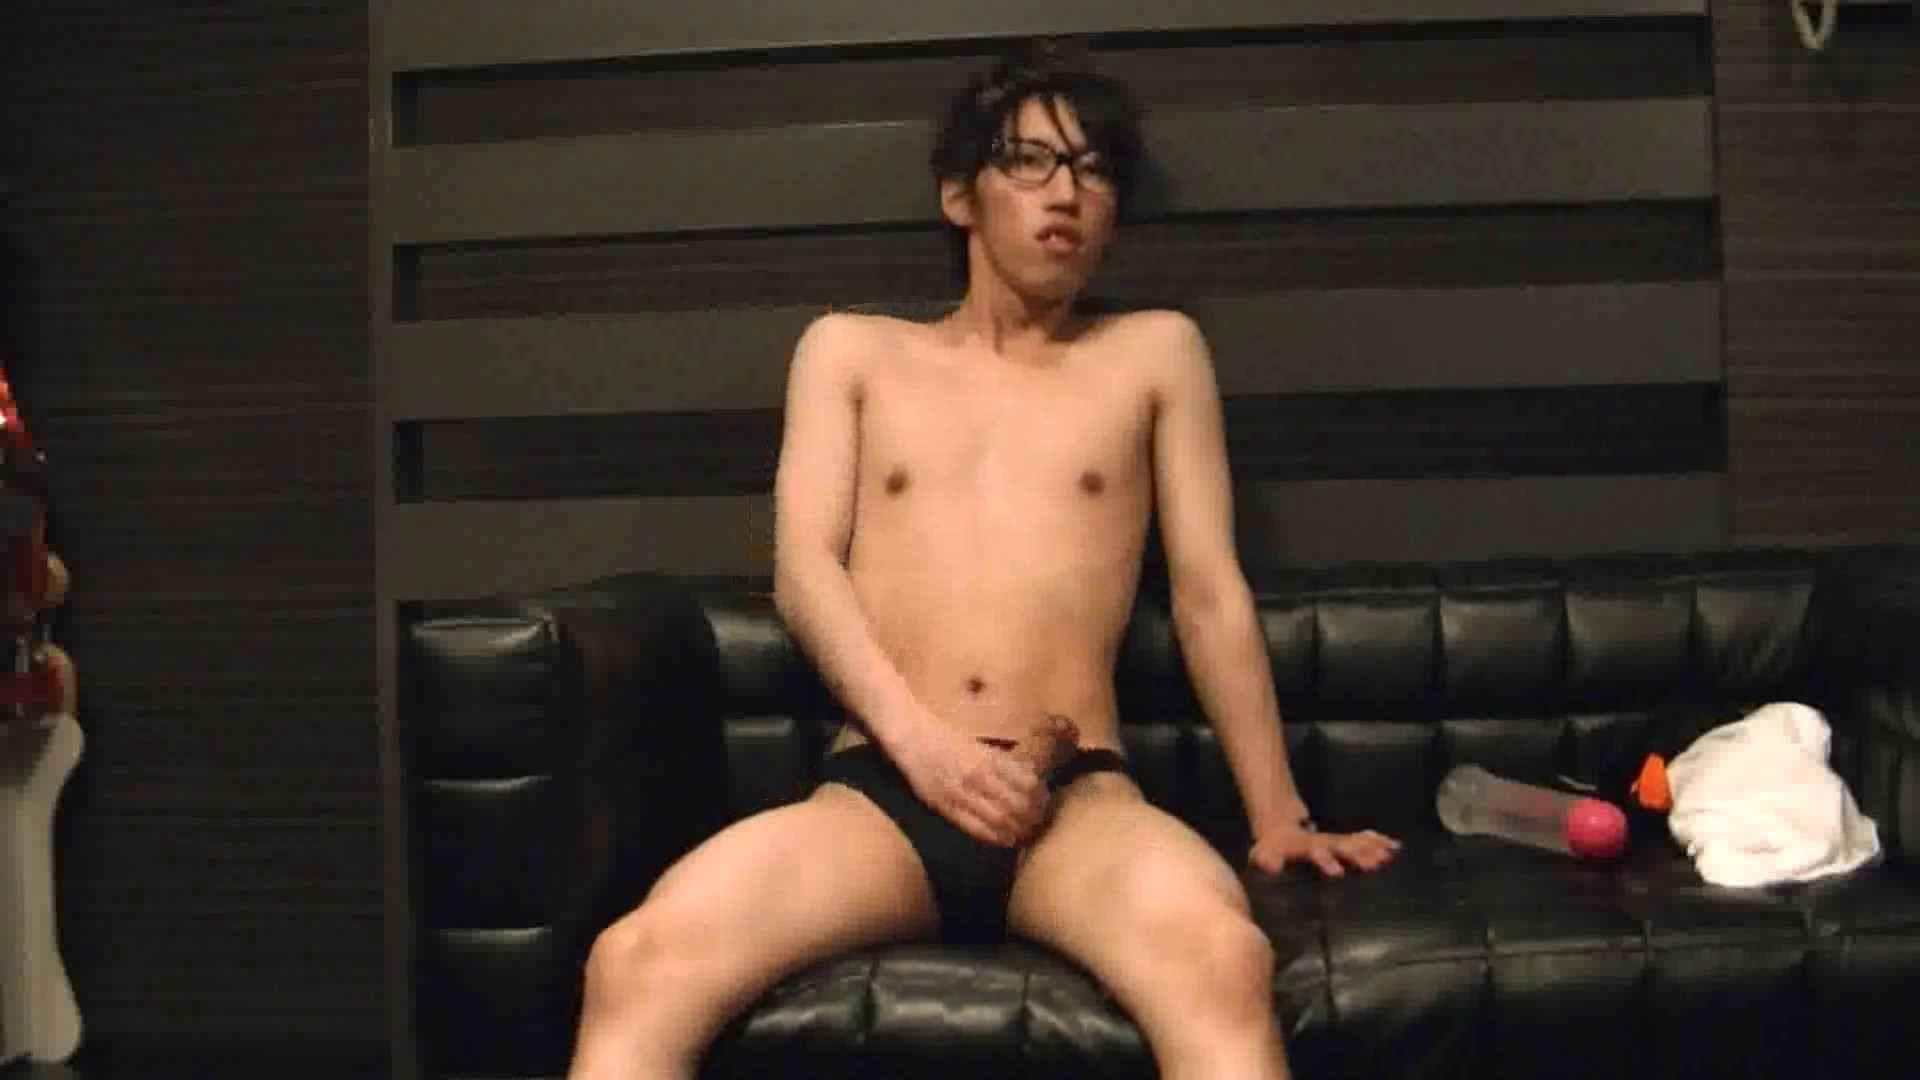 ONA見せカーニバル!! Vol3 男・男 ゲイ無料無修正画像 72pic 33